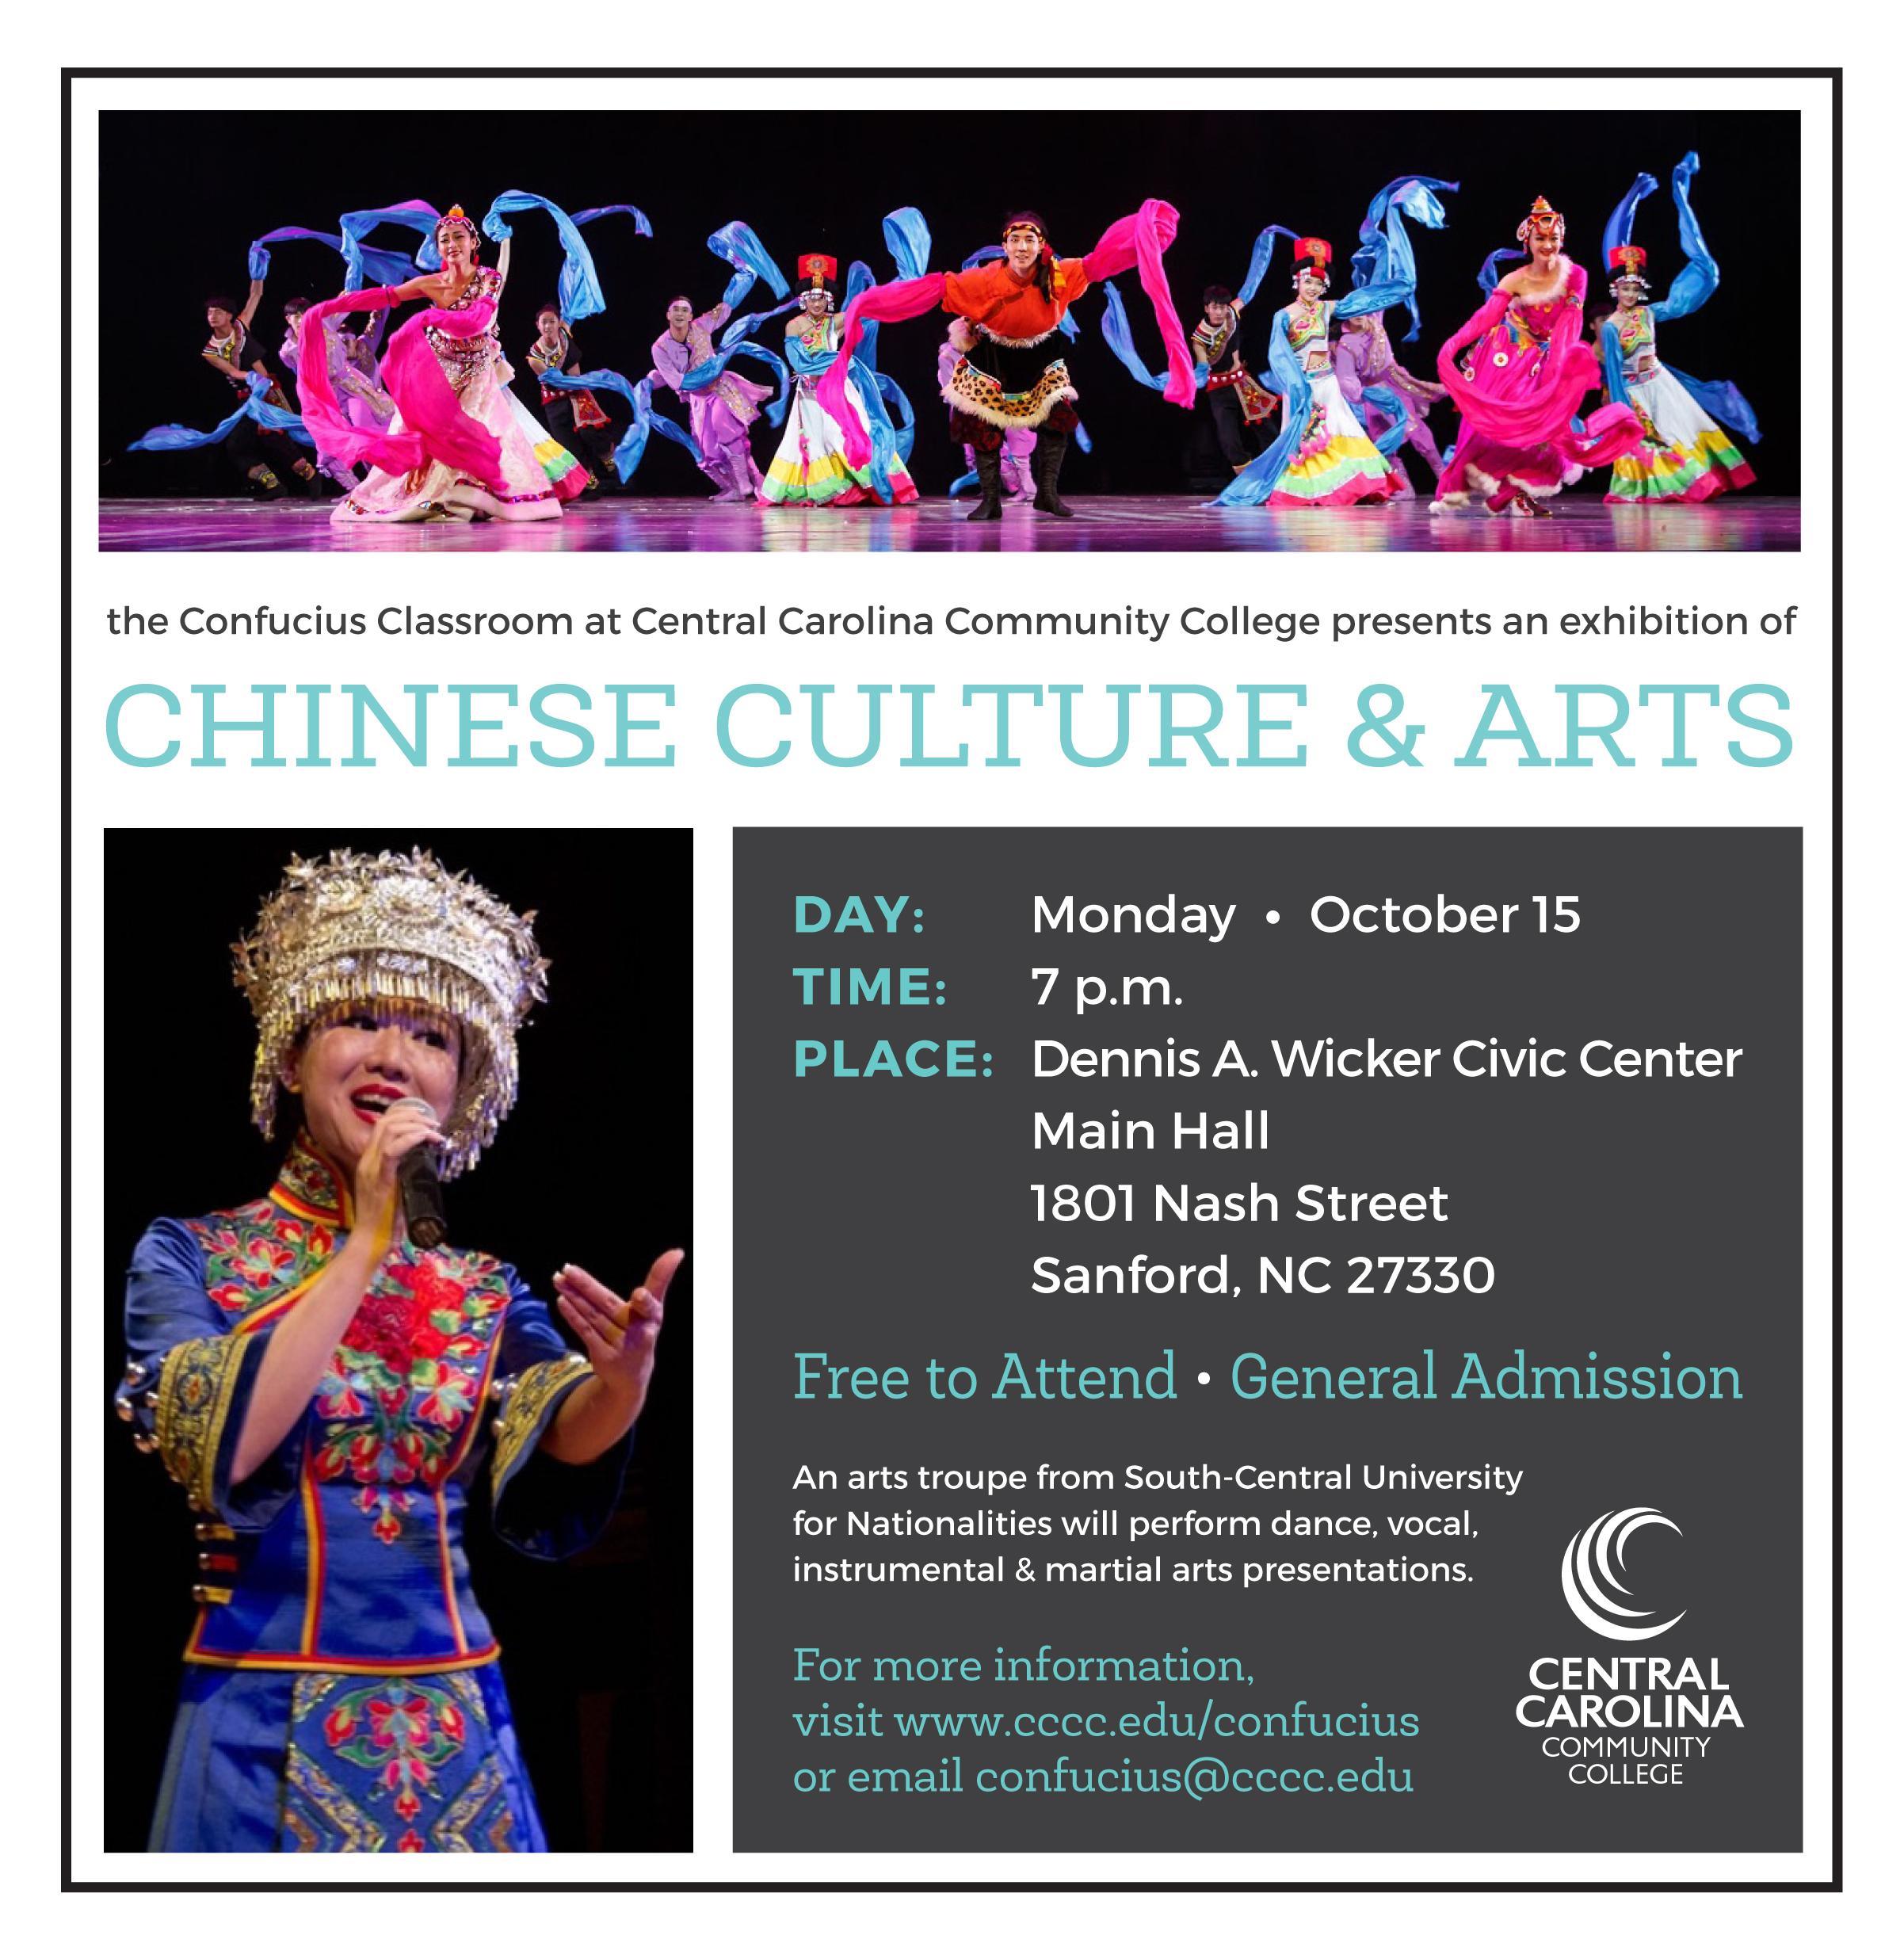 CCCC Celebrates Chinese Culture &Arts